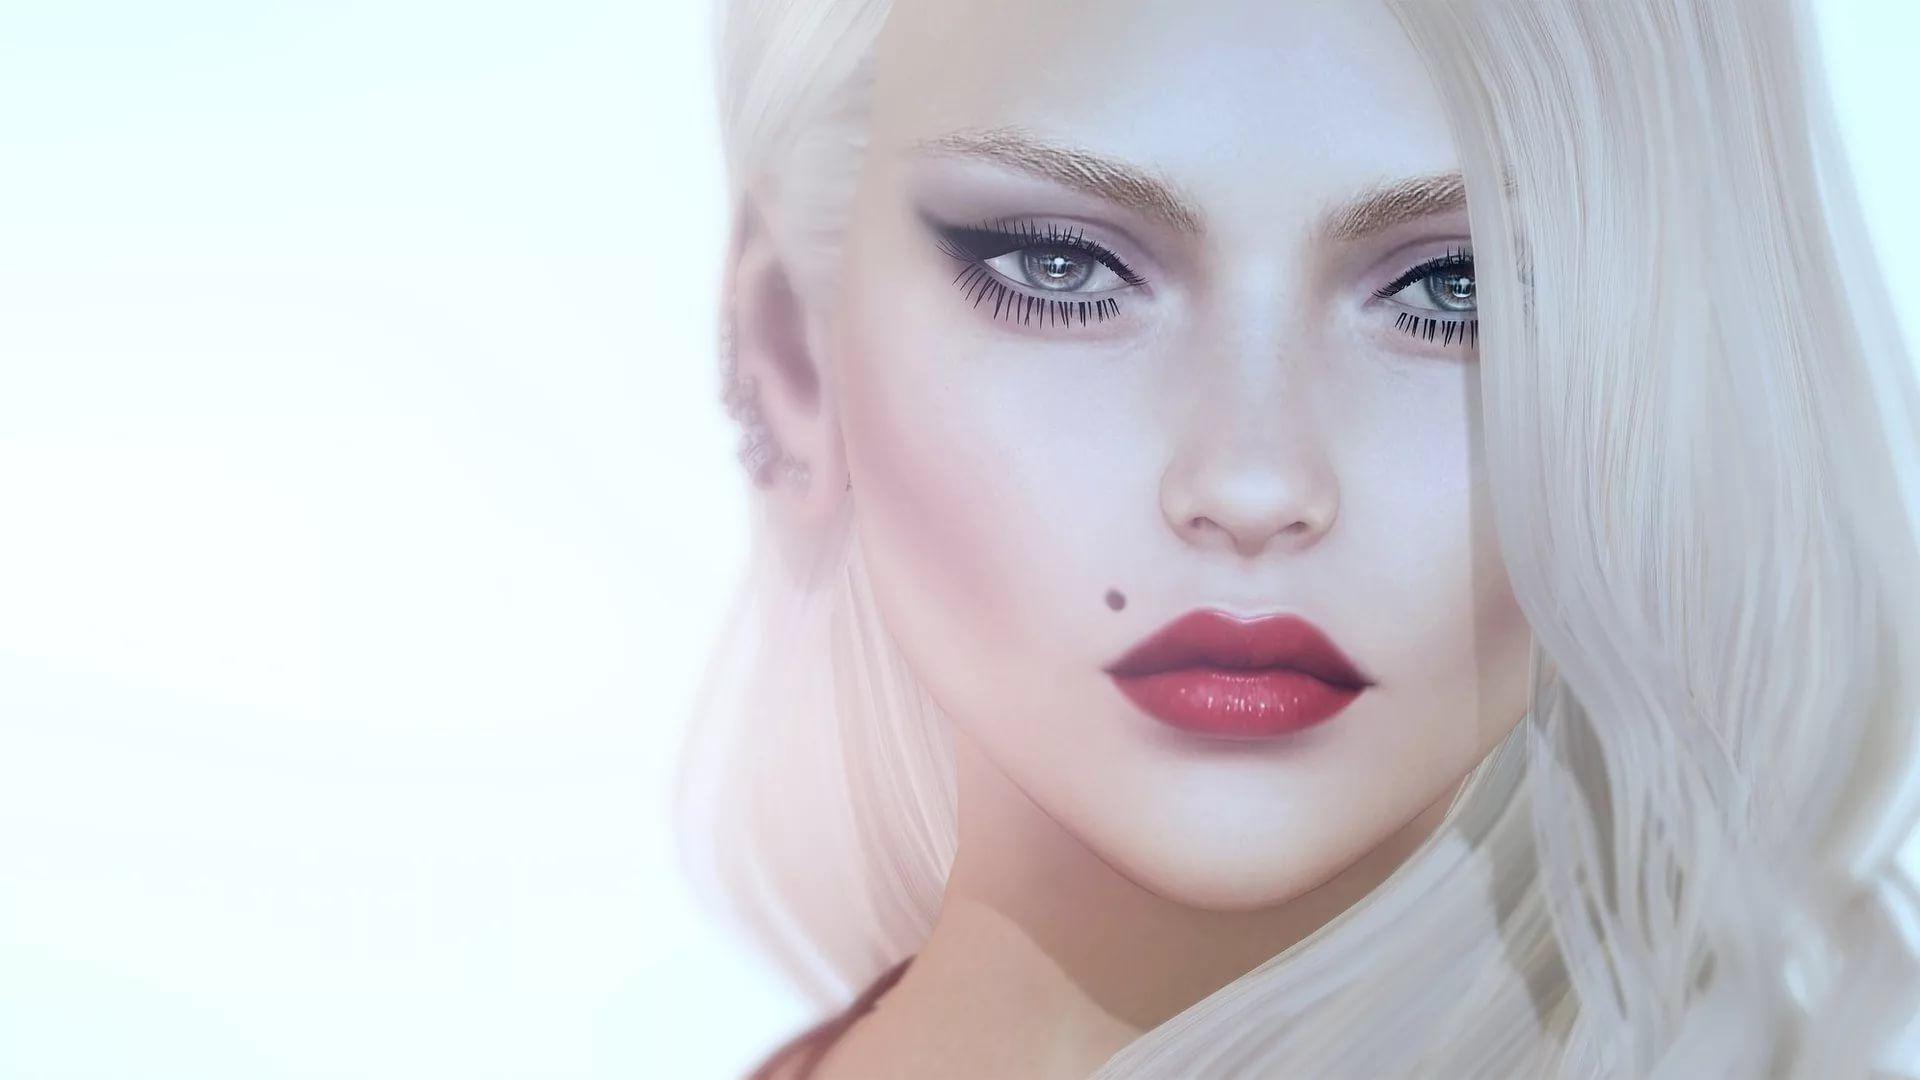 3D Girl wallpaper photo